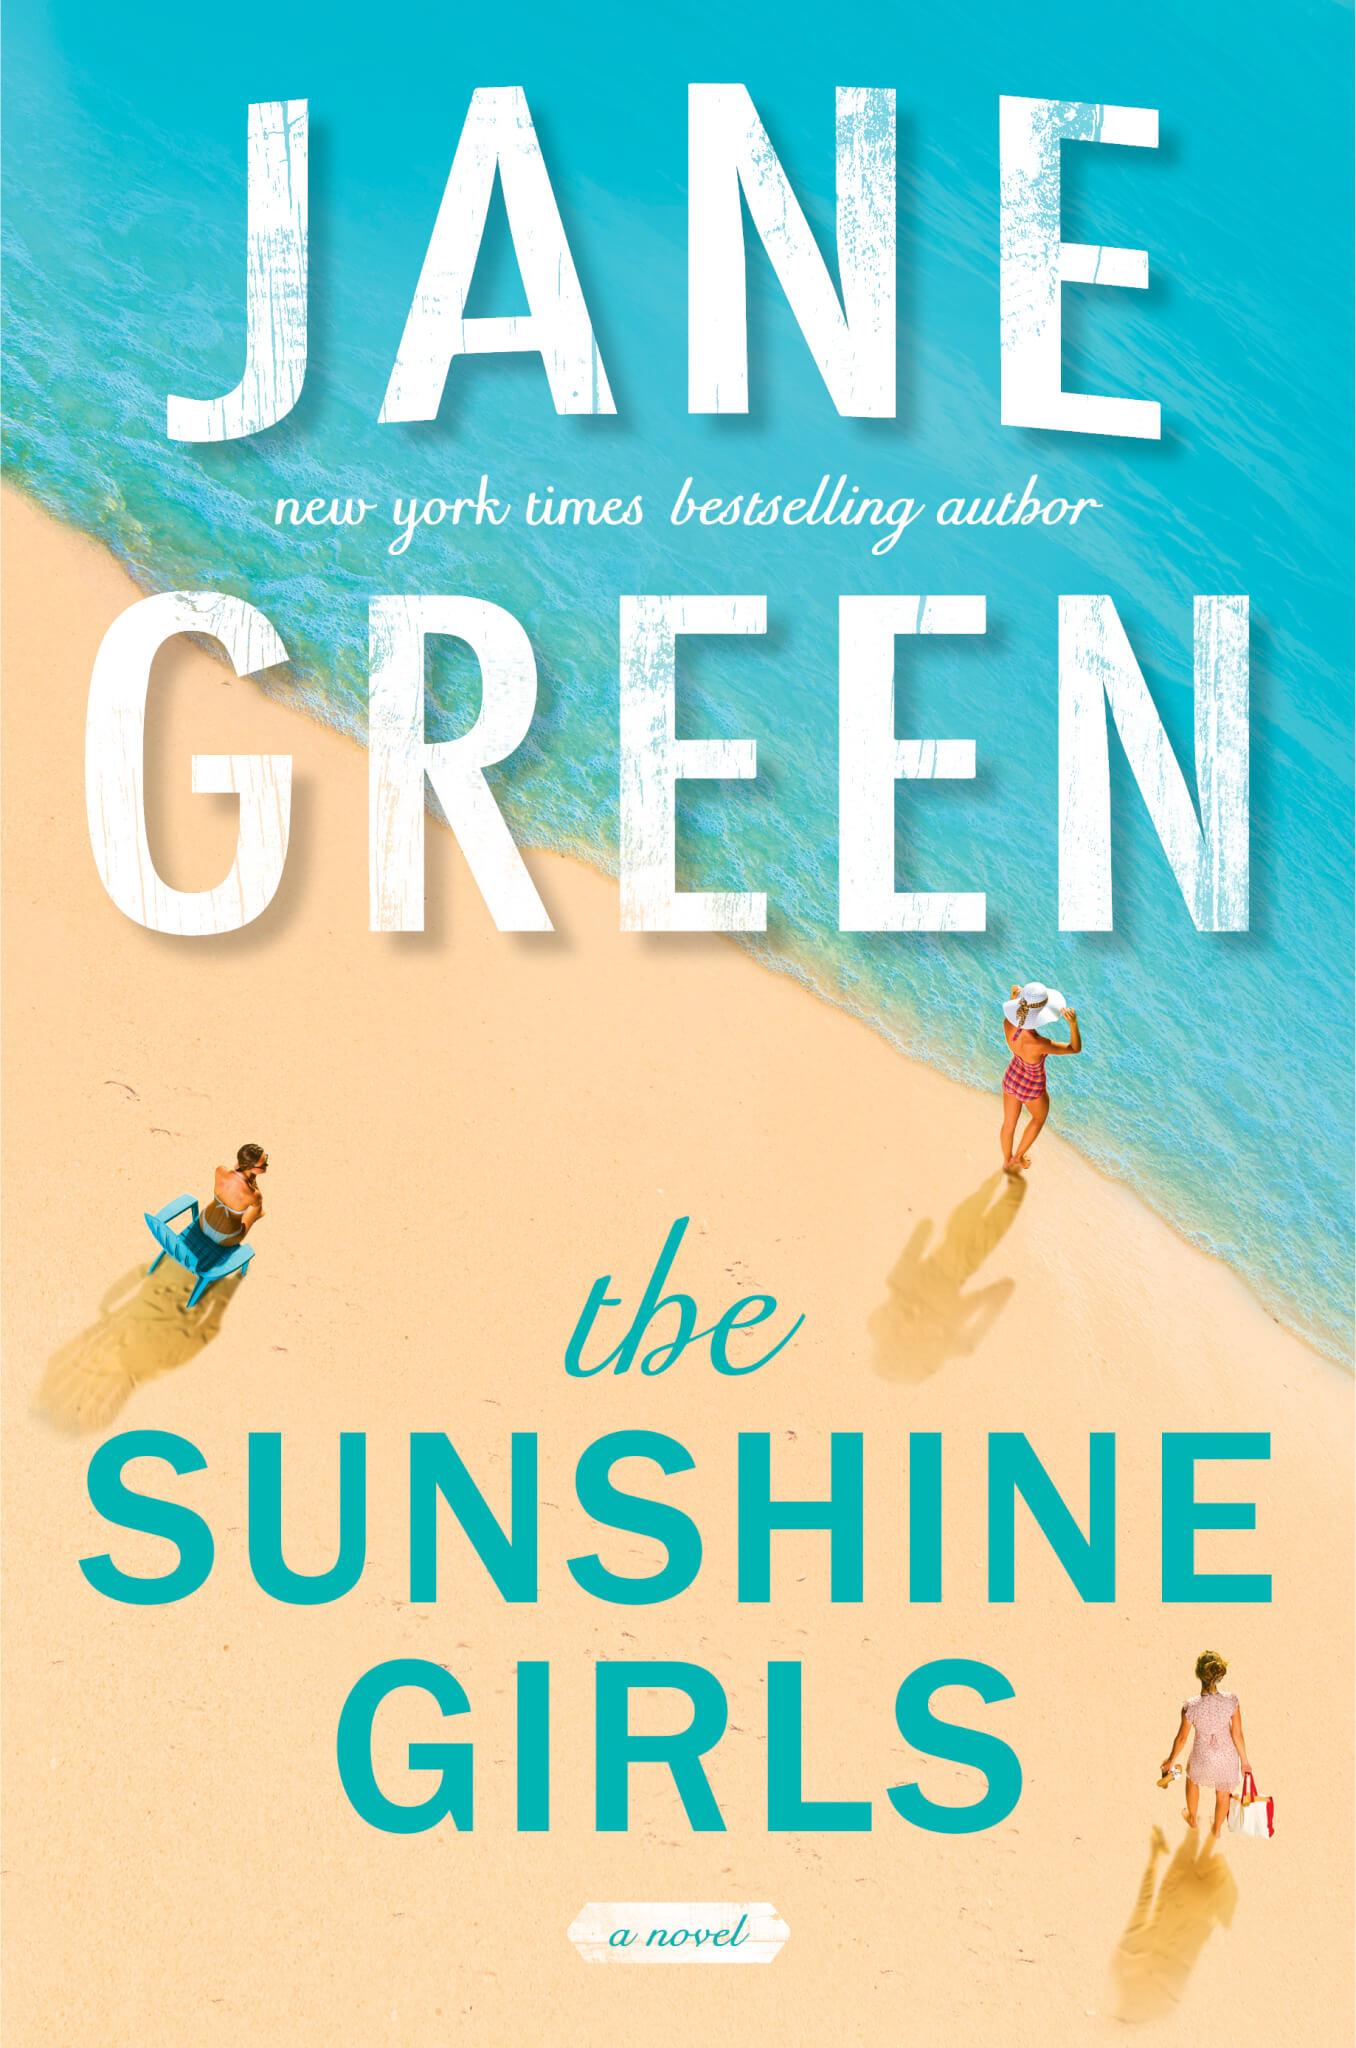 The Sunshine Girls by Jane Green